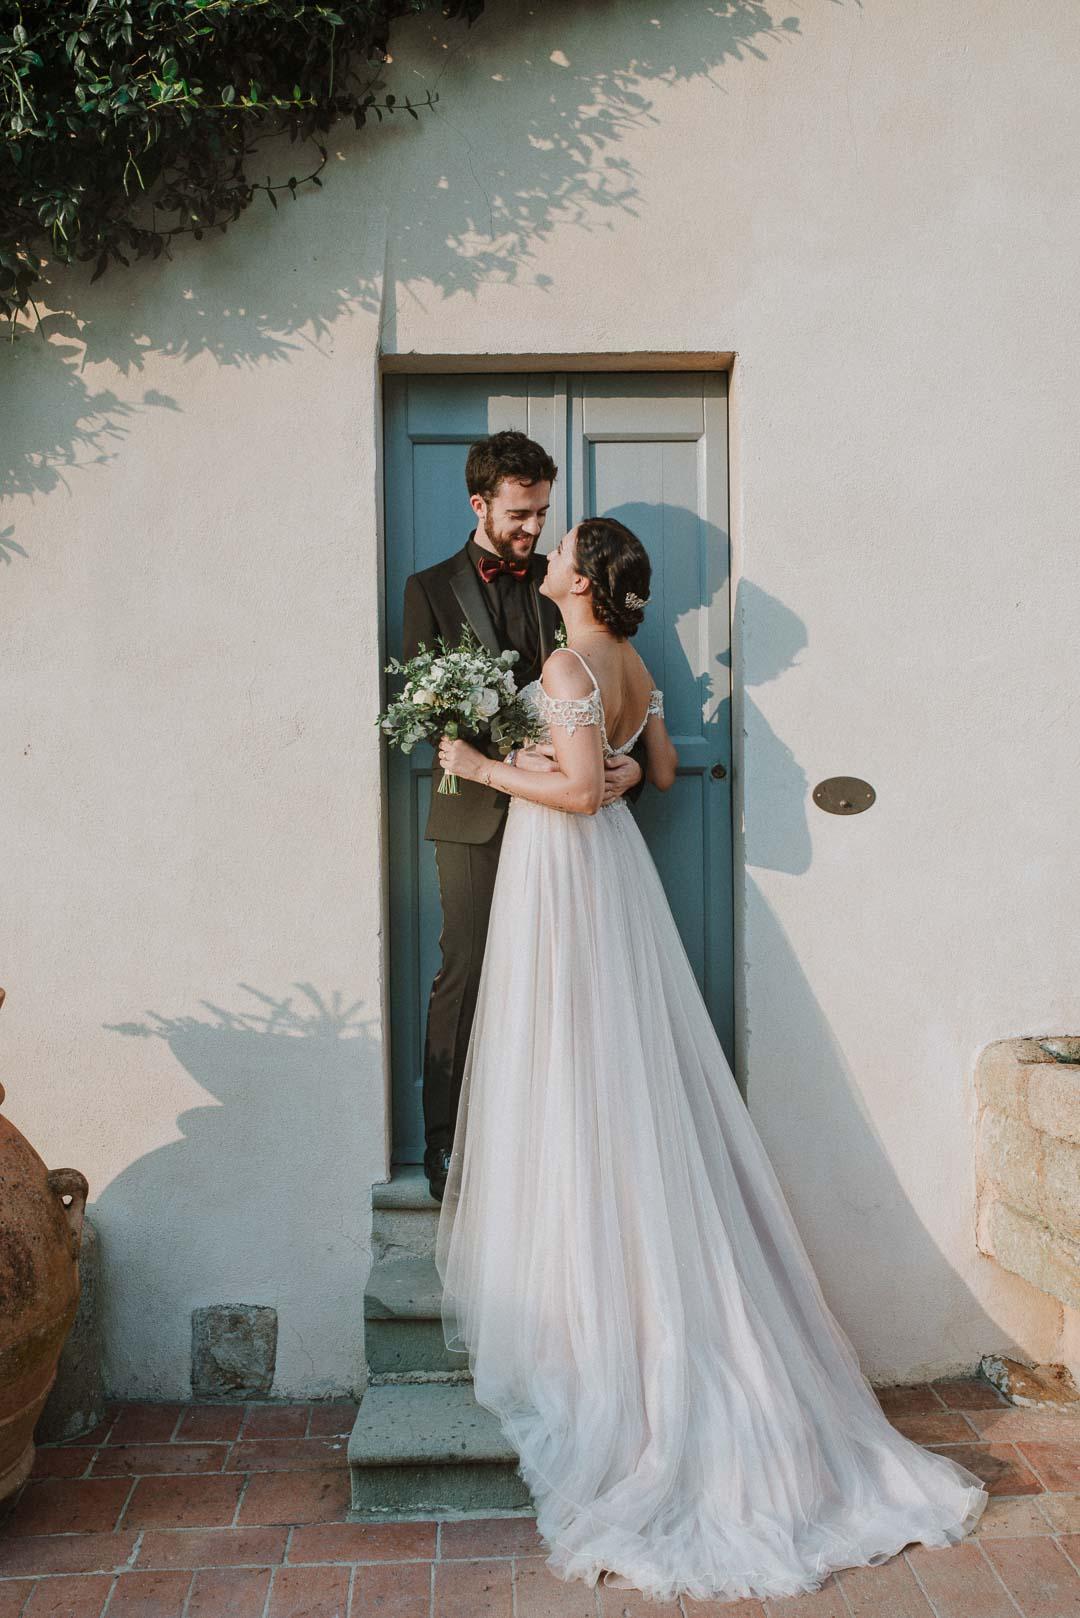 wedding-photographer-destination-fineart-bespoke-reportage-tuscany-villascorzi-vivianeizzo-spazio46-106